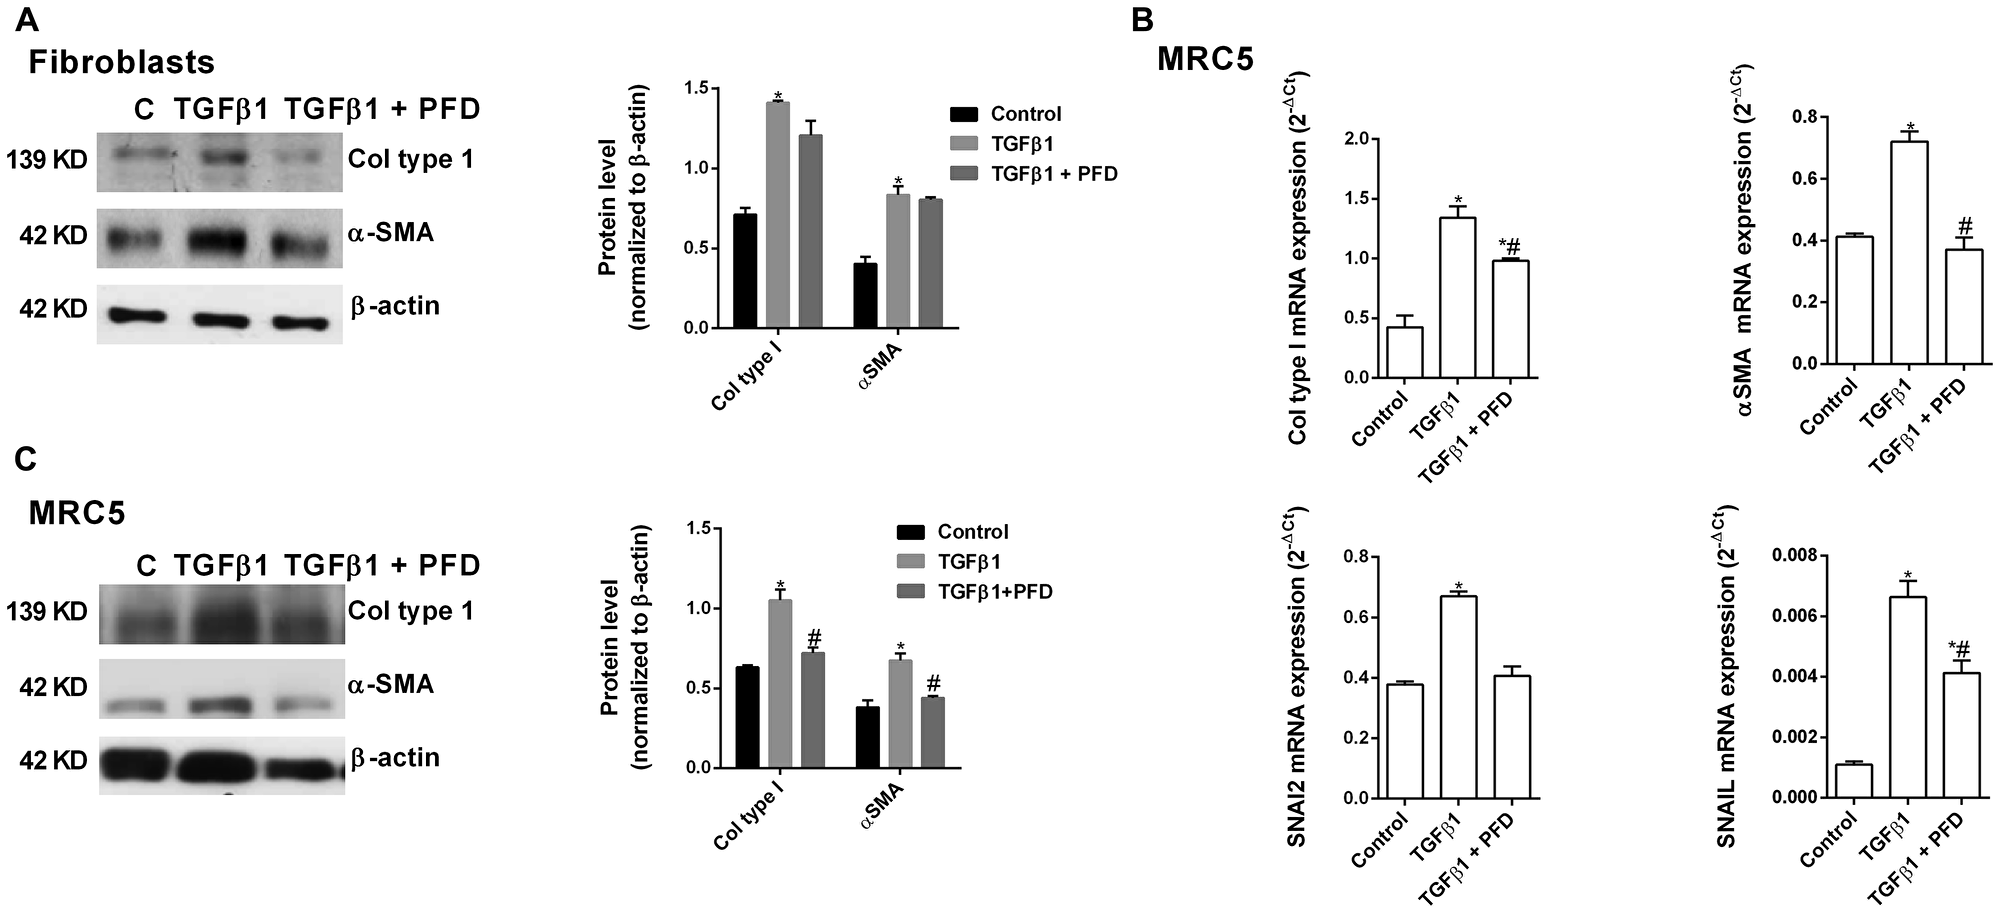 Pirfenidone (PFD) inhibits the TGF-β1-induced fibroblast to myofibroblast transition.